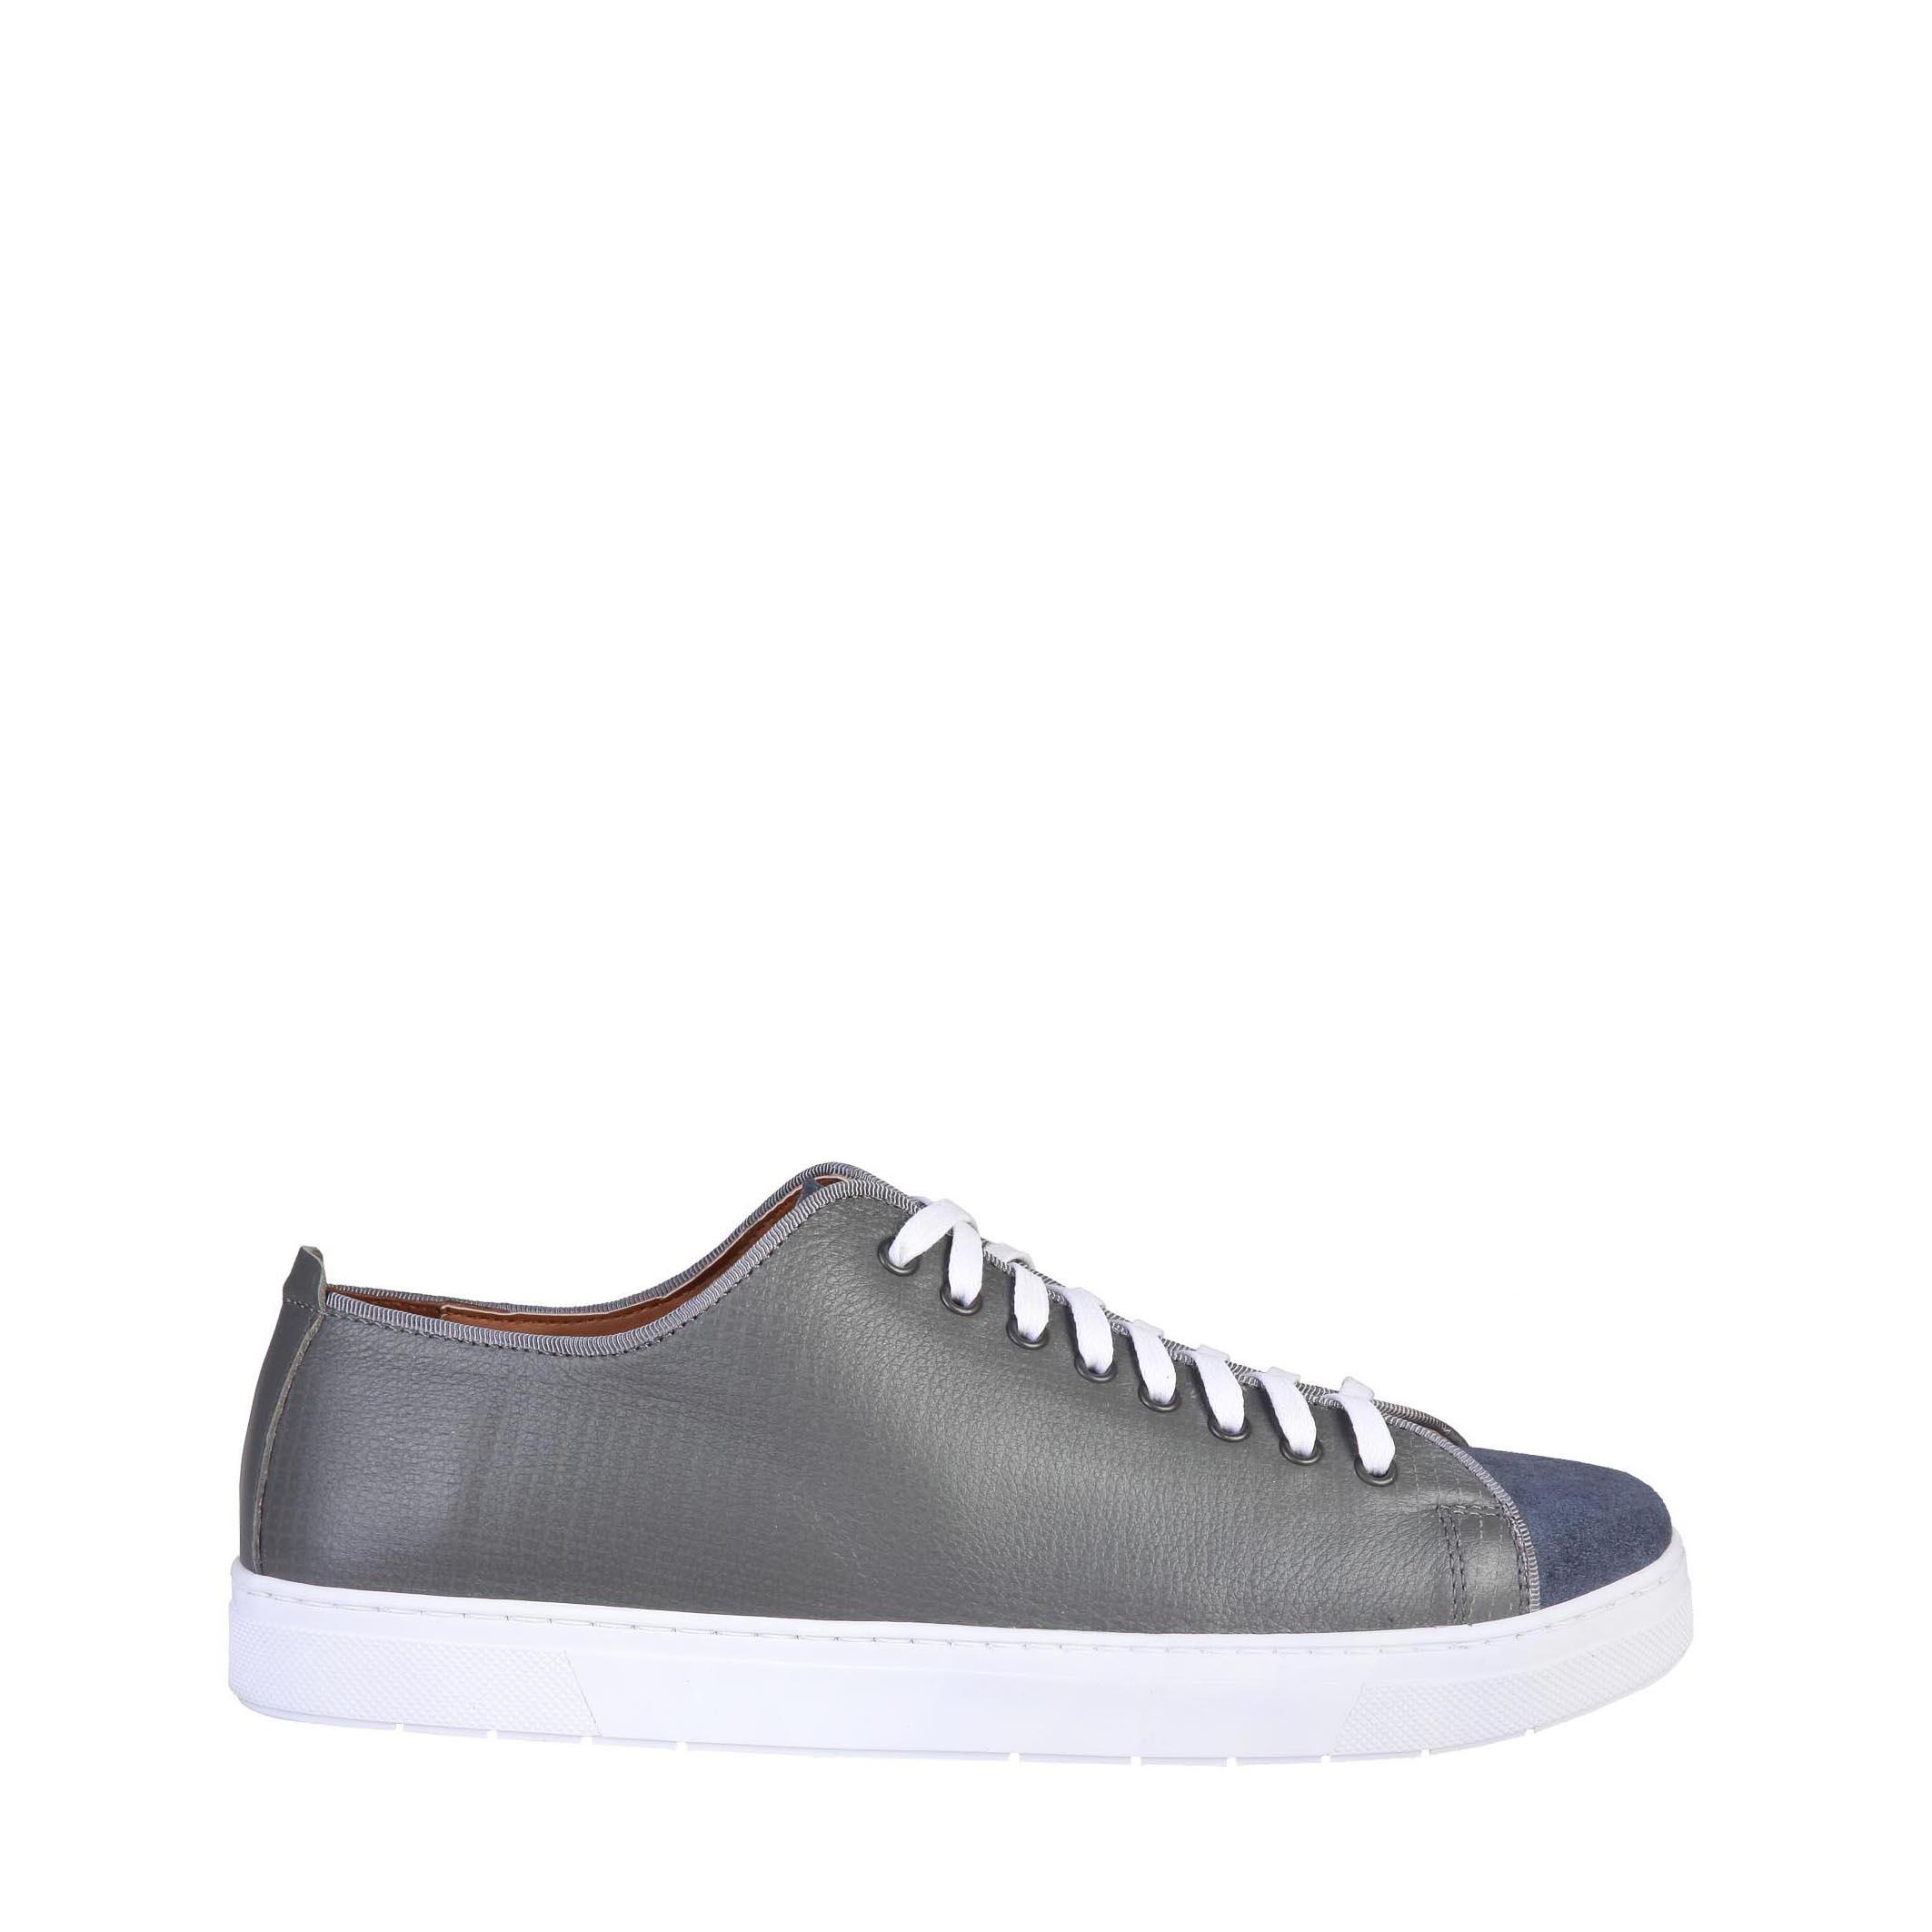 18e726eb279f Sneakers Pierre Cardin - EDGARD | Brandsdistribution !